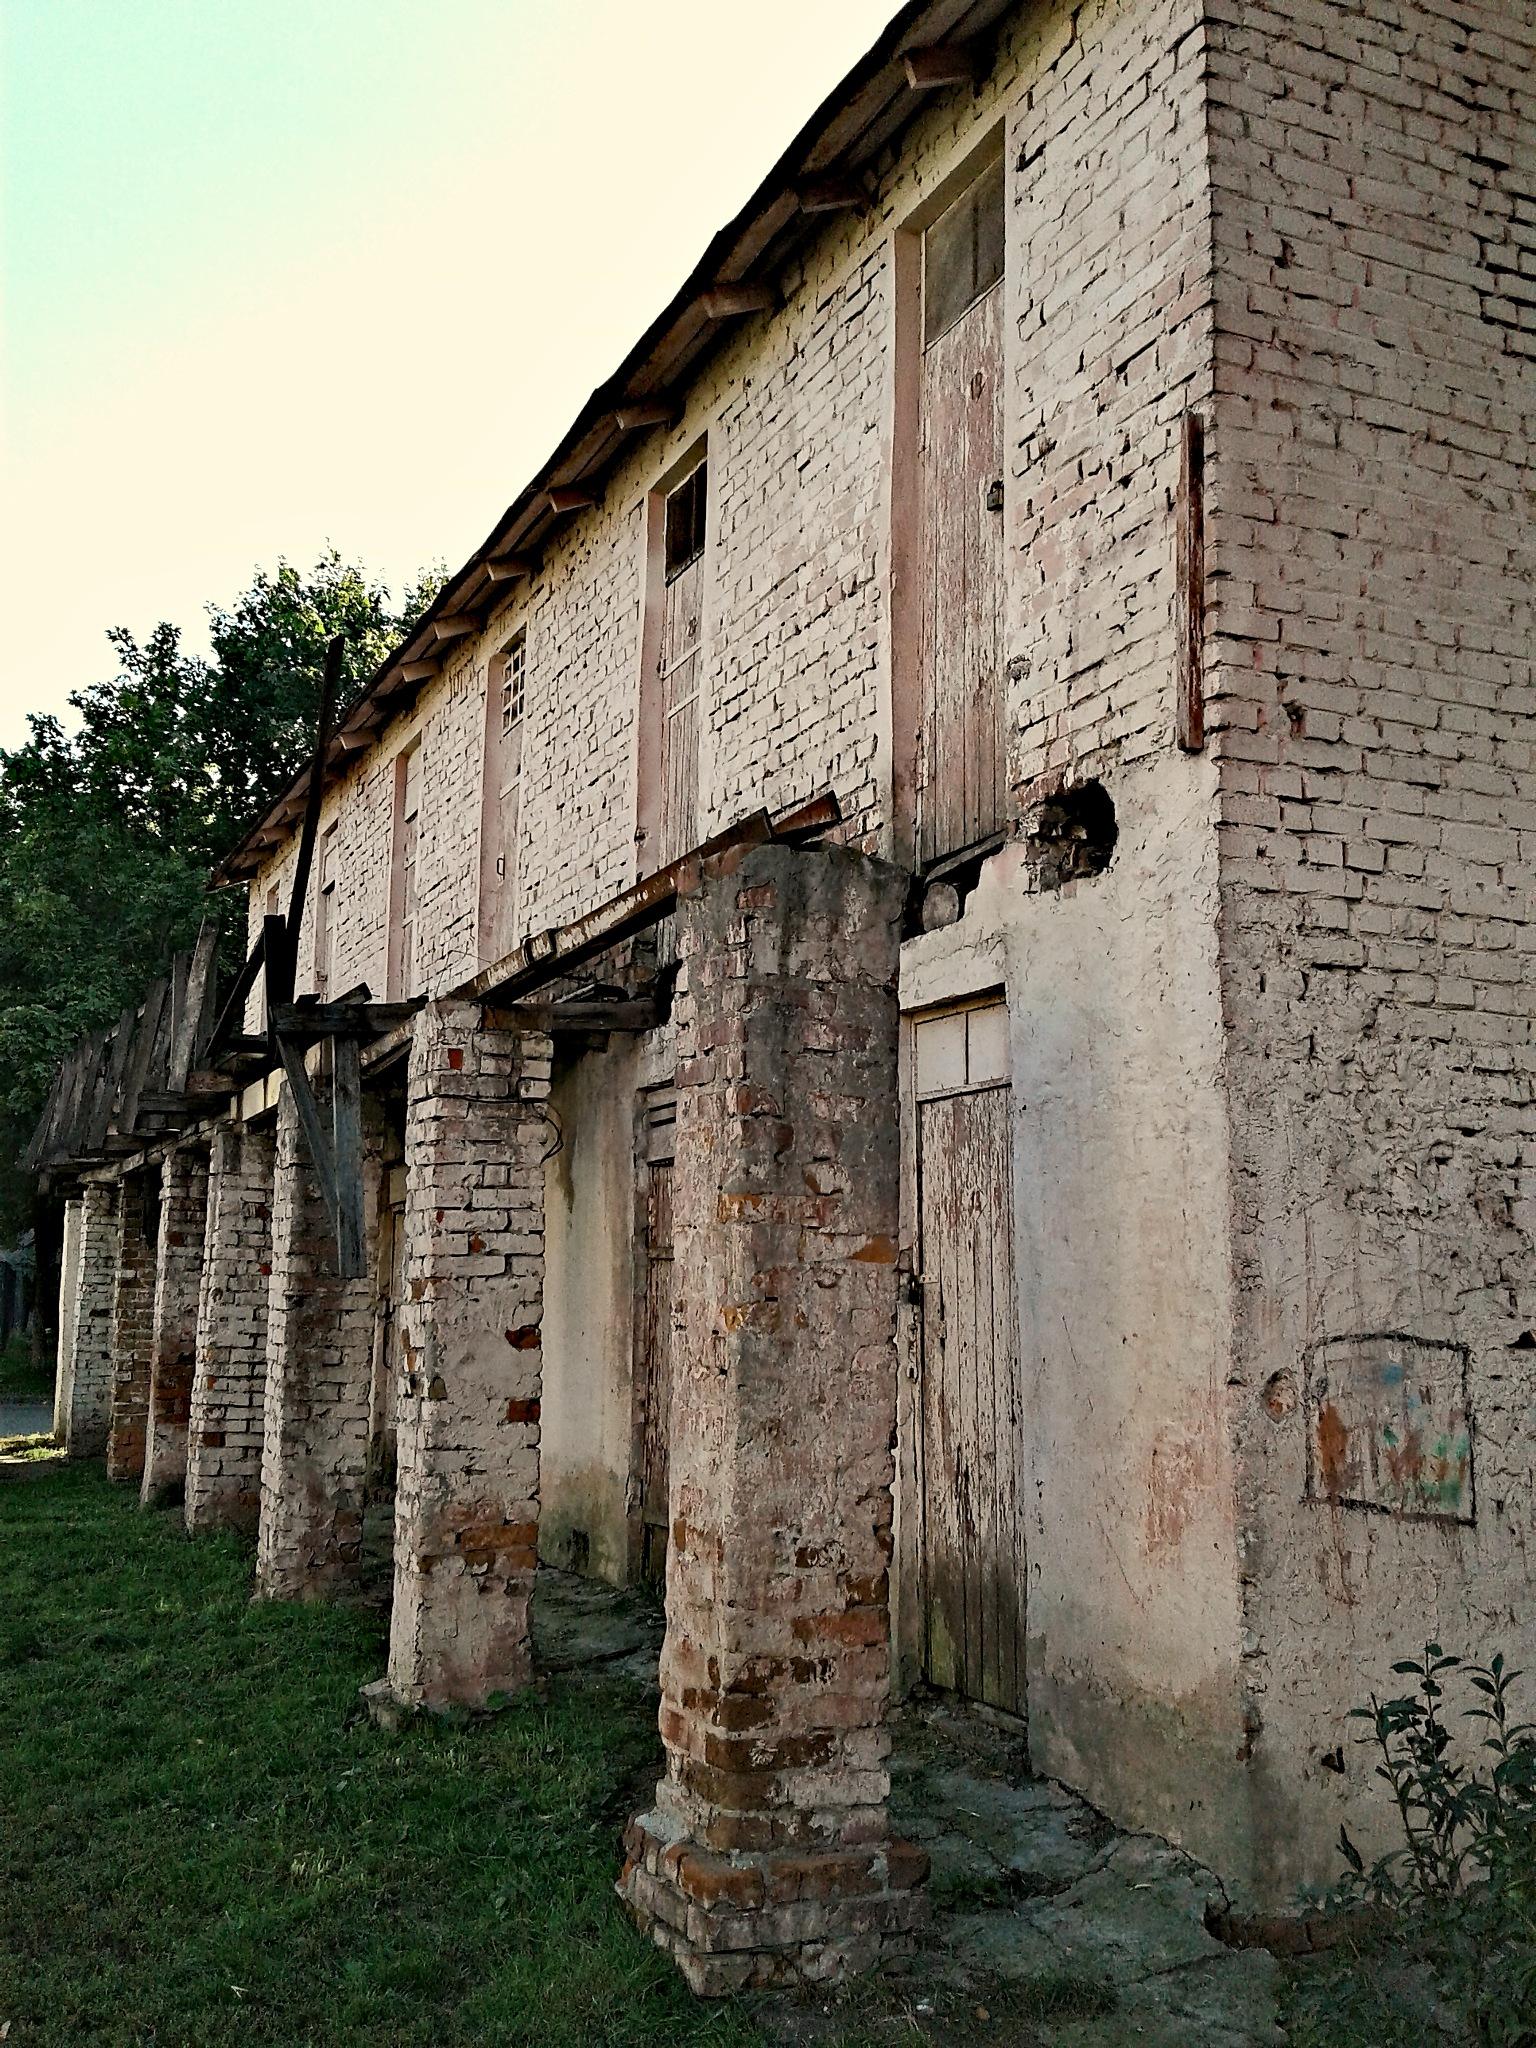 The old barn by Евгений Козлов